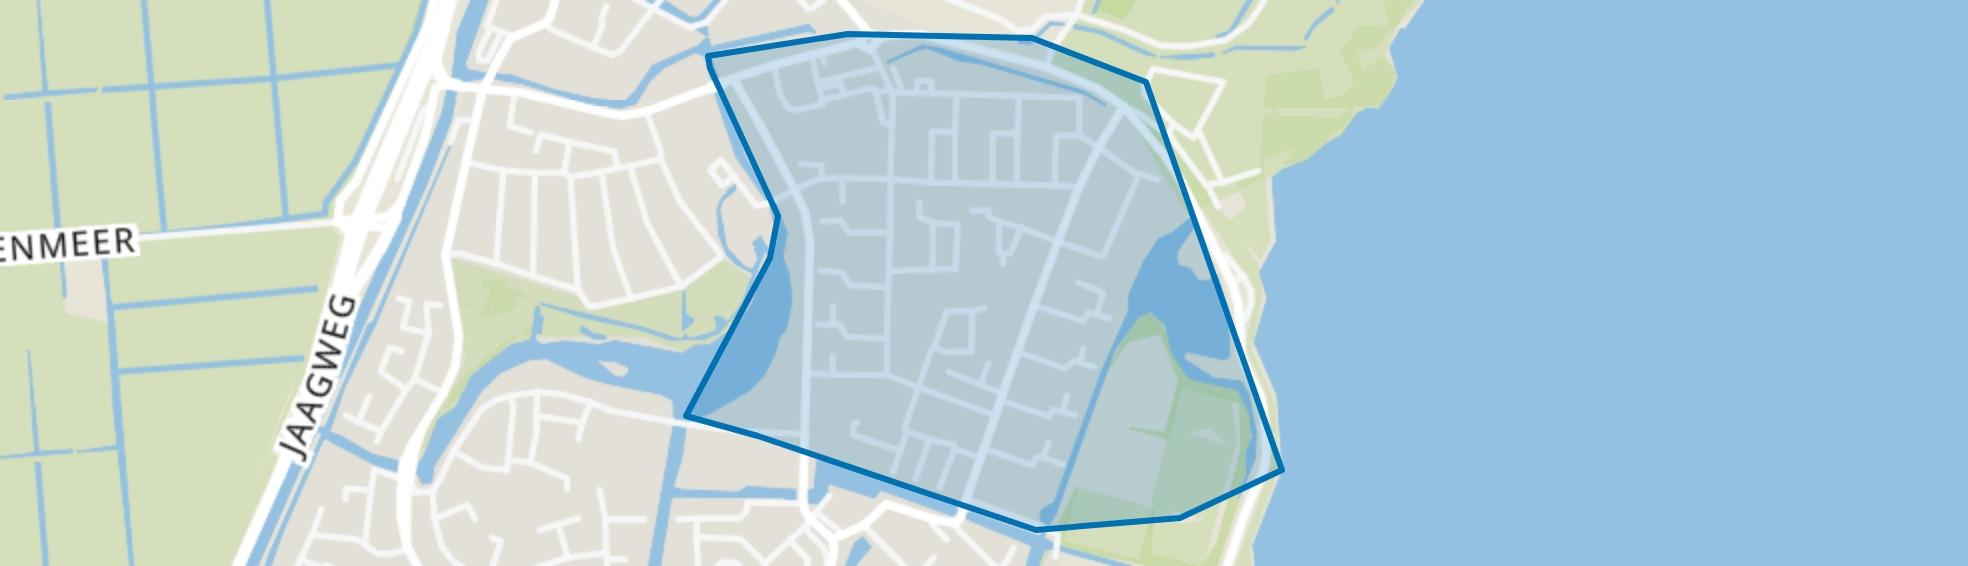 Markgouw, Monnickendam map